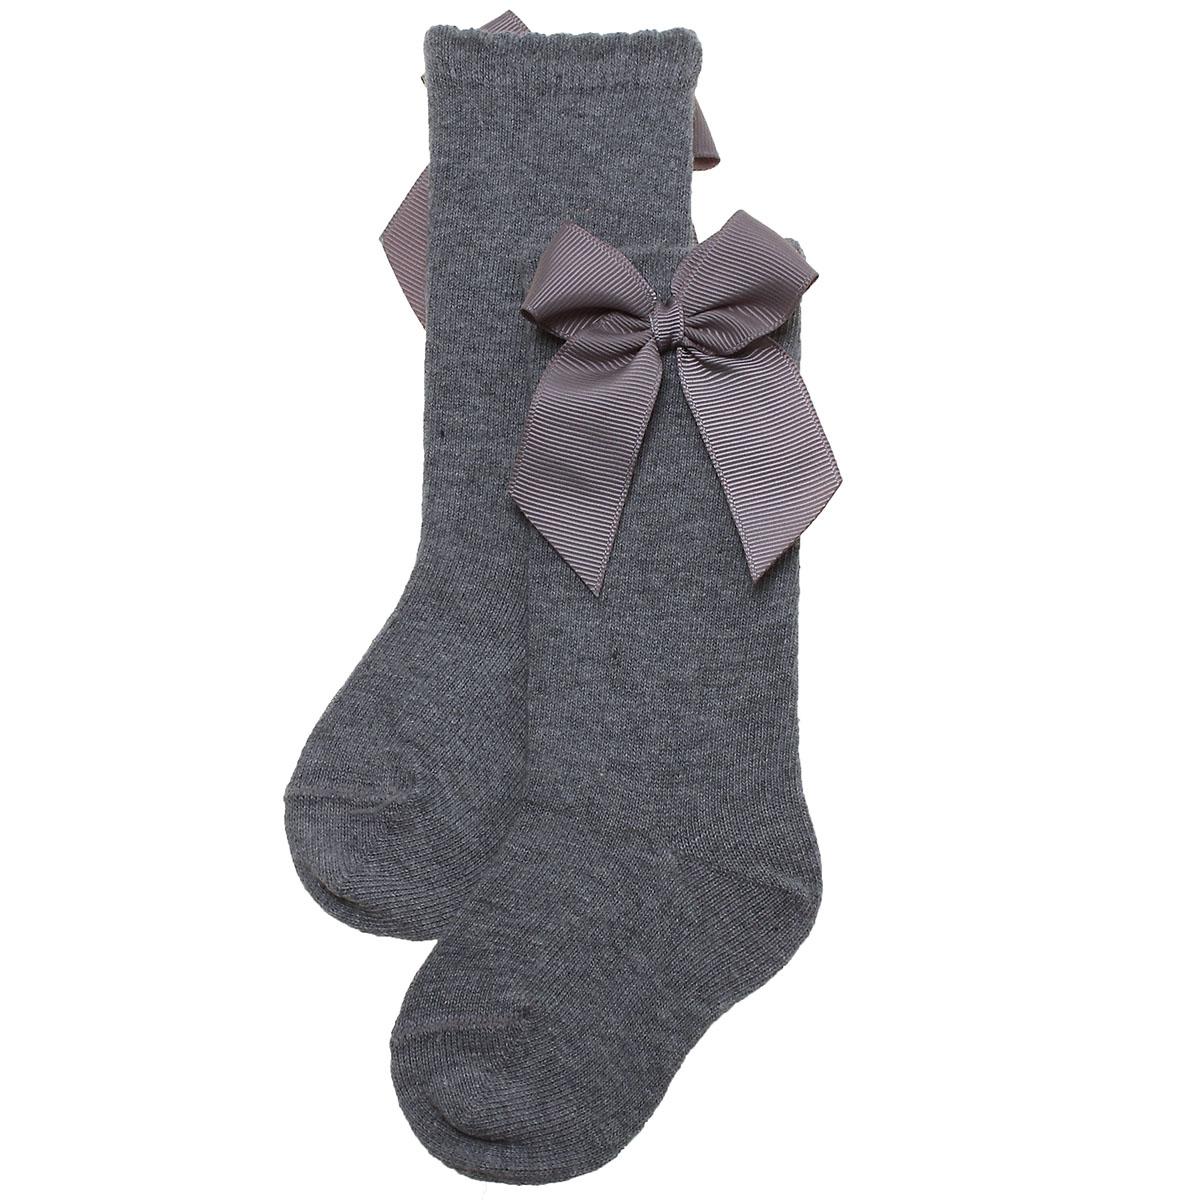 4e88b16a704c6 Grey Colour Girls Knee High Gros Grain Bow Socks | Cachet Kids